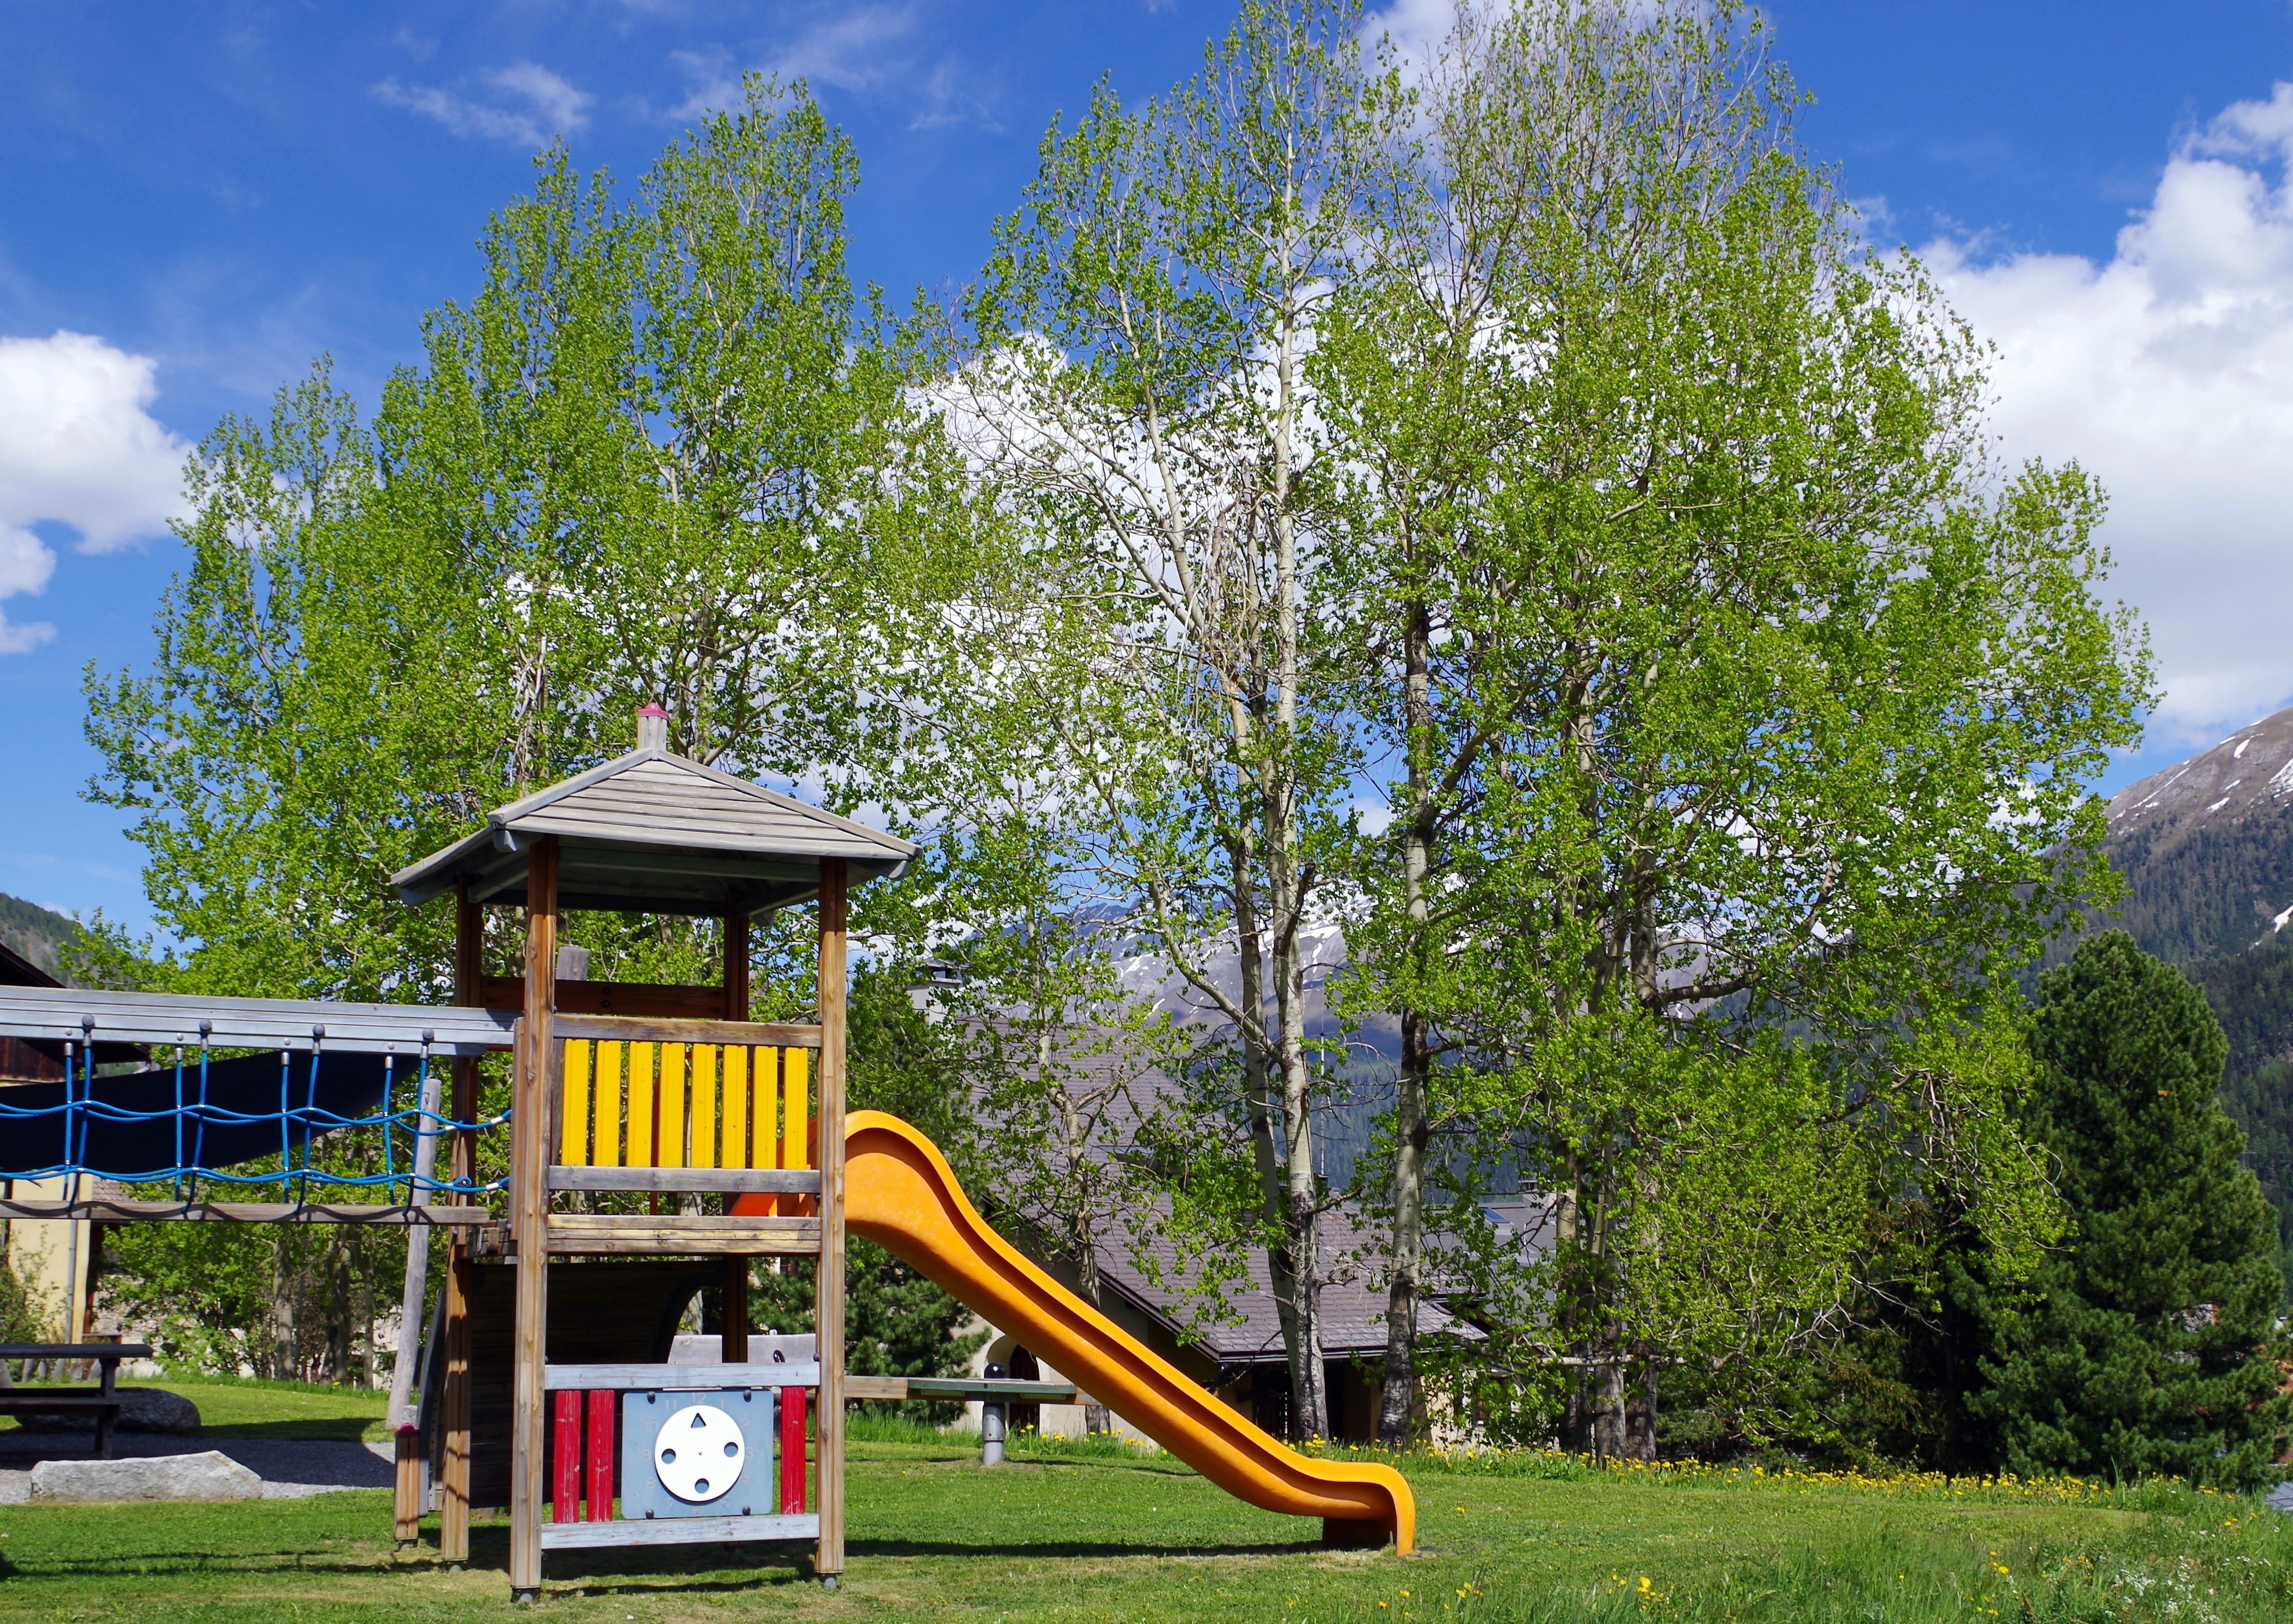 Kinderspielplatz Eulalia Slide 6